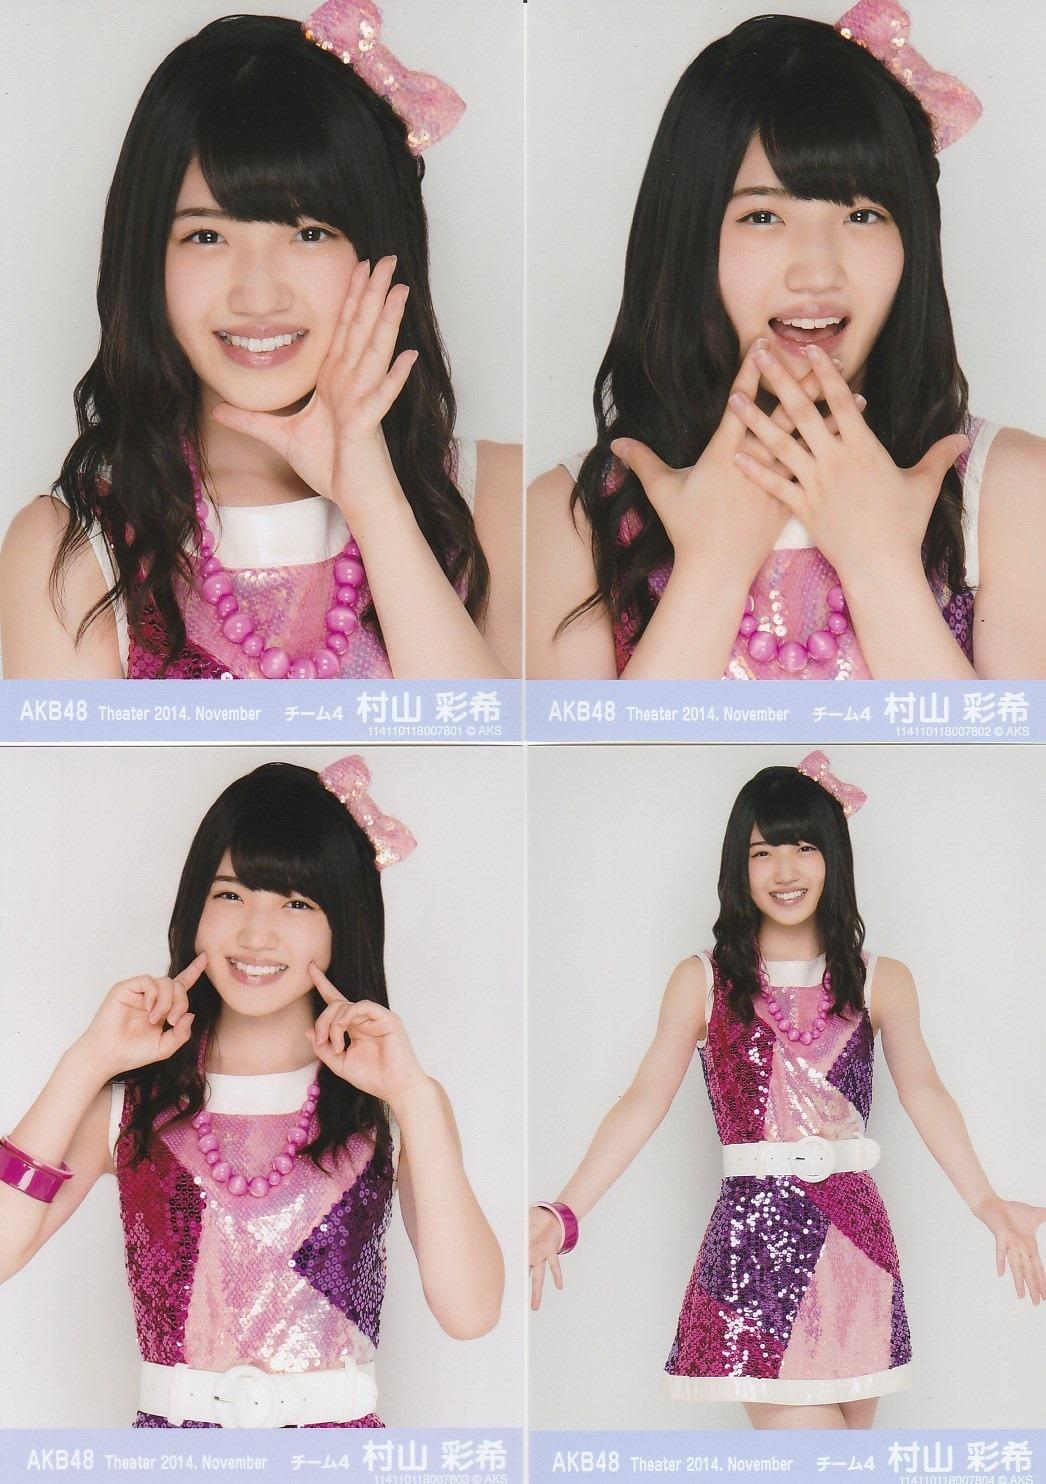 AKB48 Theater Photos   November 2014